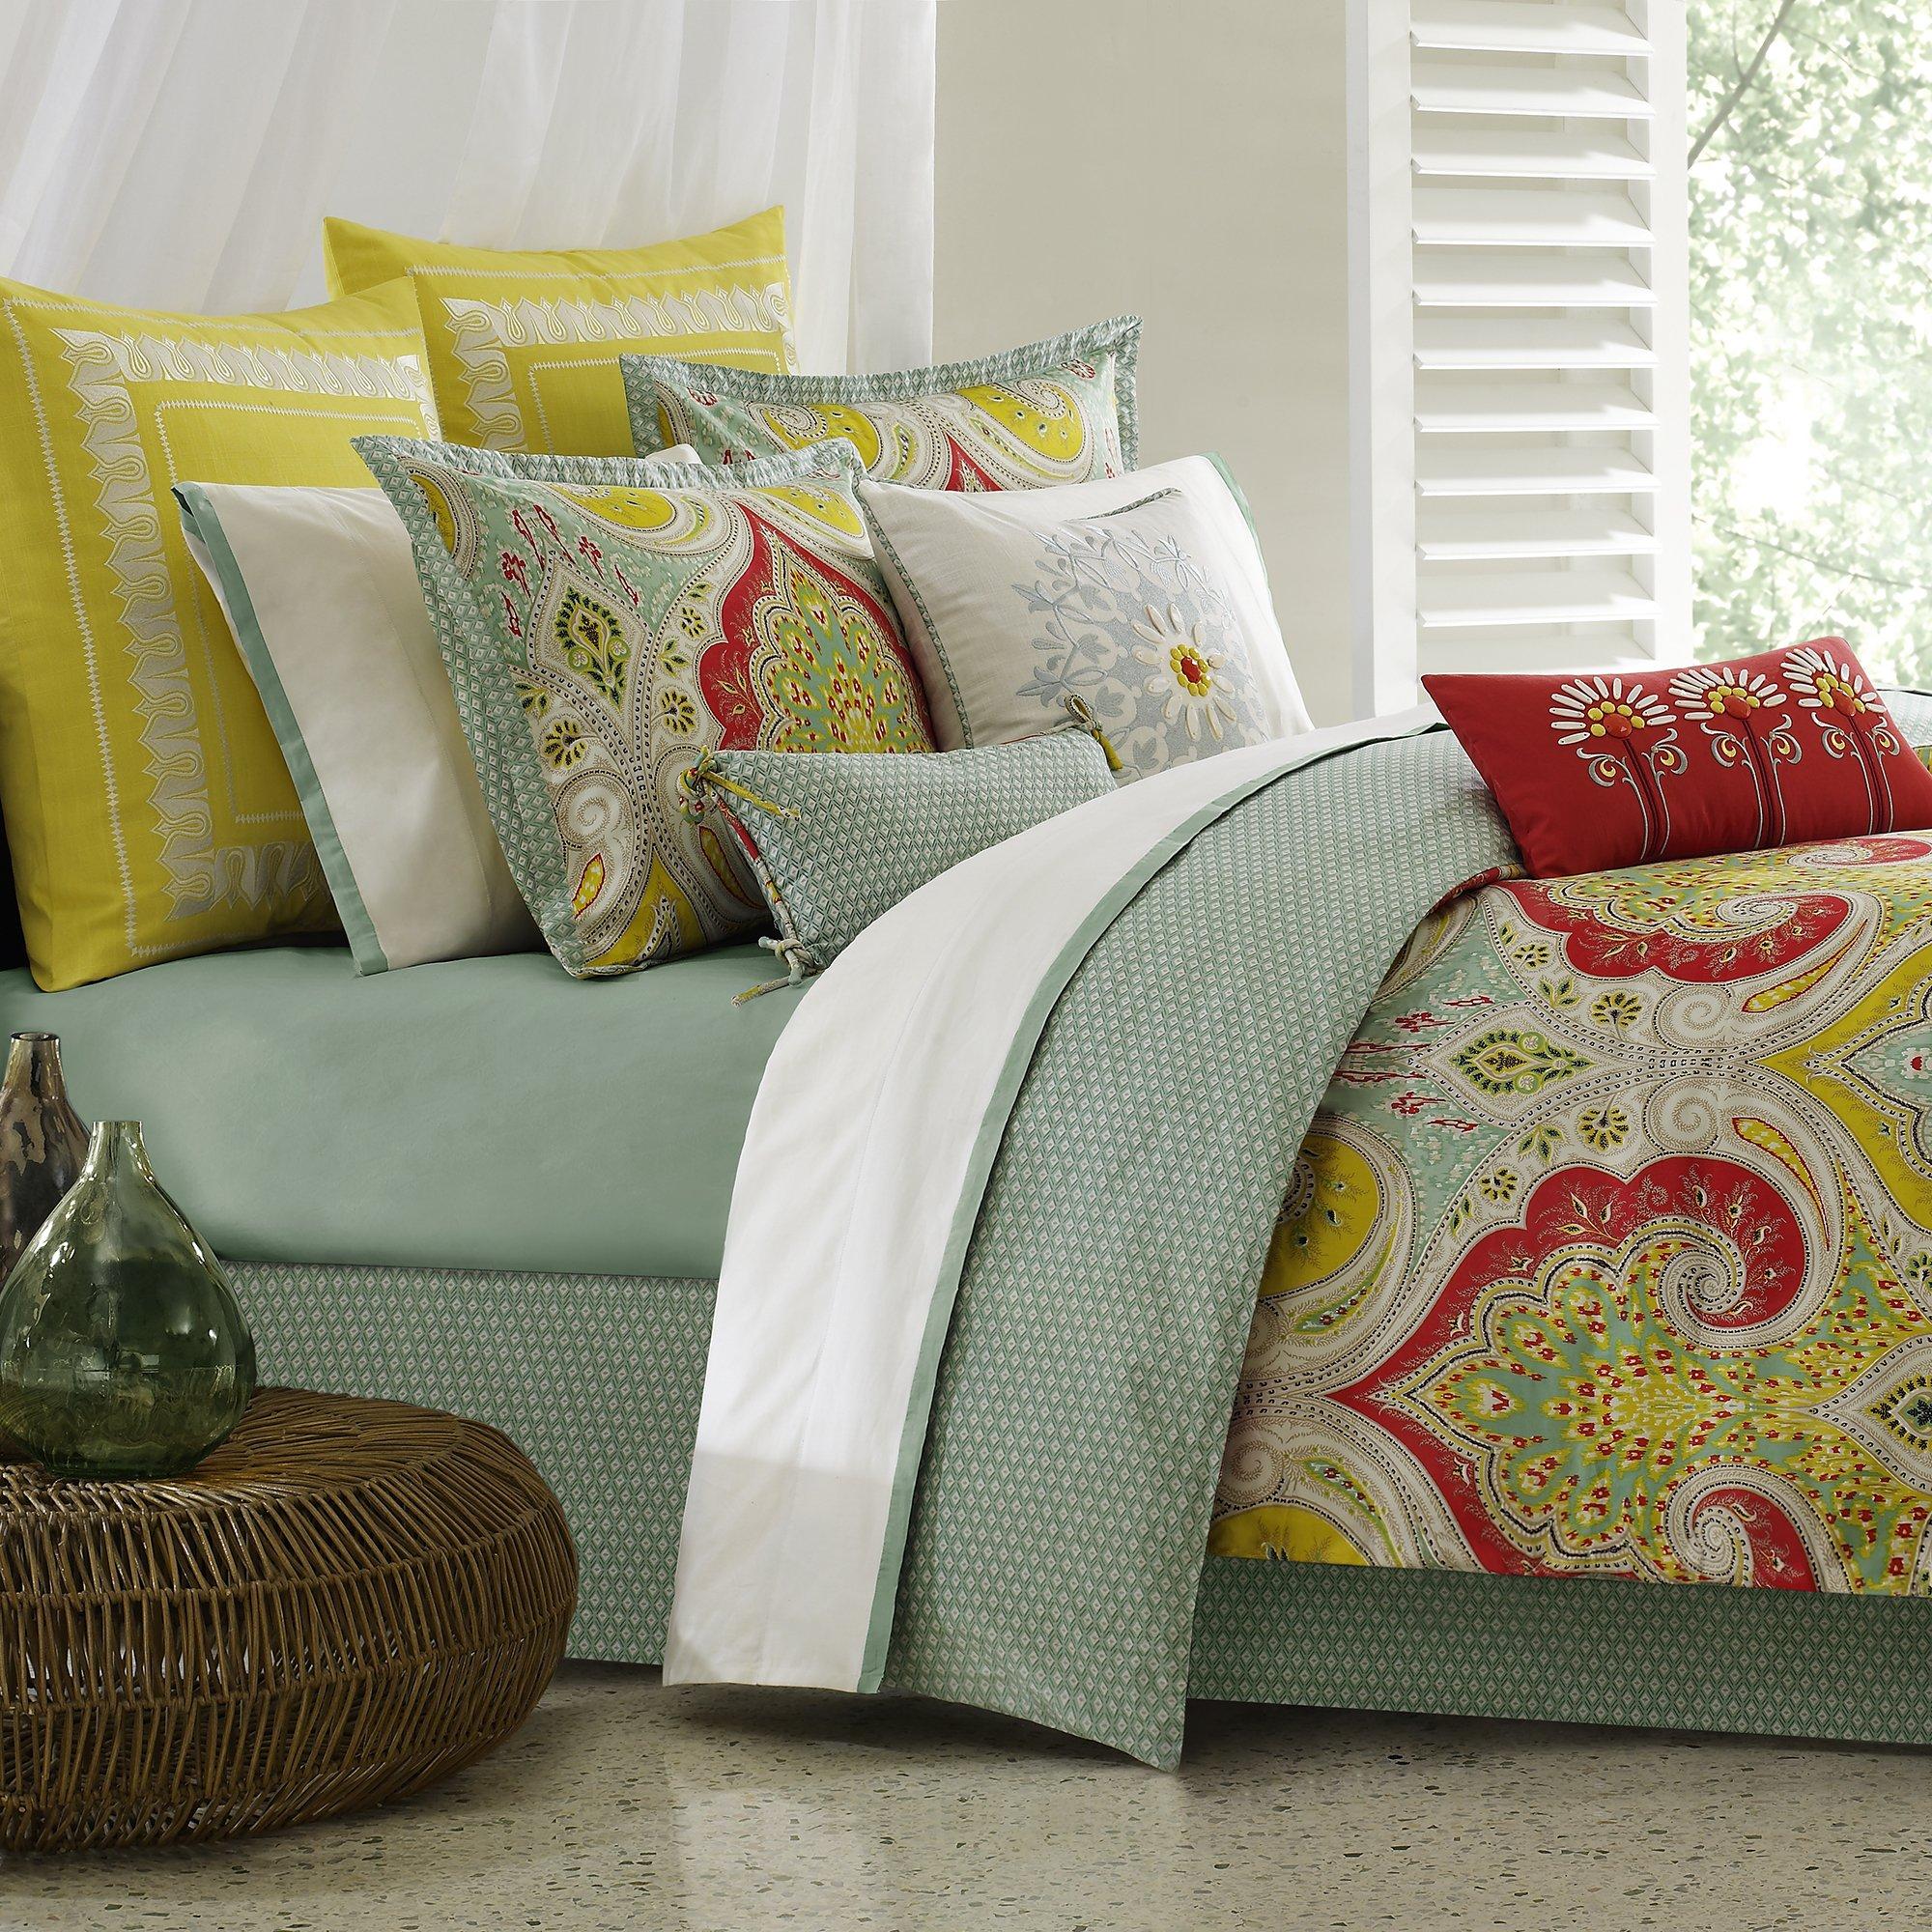 Echo Design Jaipur Comforter Set Queen Size - Aqua, Yellow, Red, Bohemian Paisley Damask – 4 Piece Bed Sets – 100% Cotton Teen Bedding For Girls Bedroom